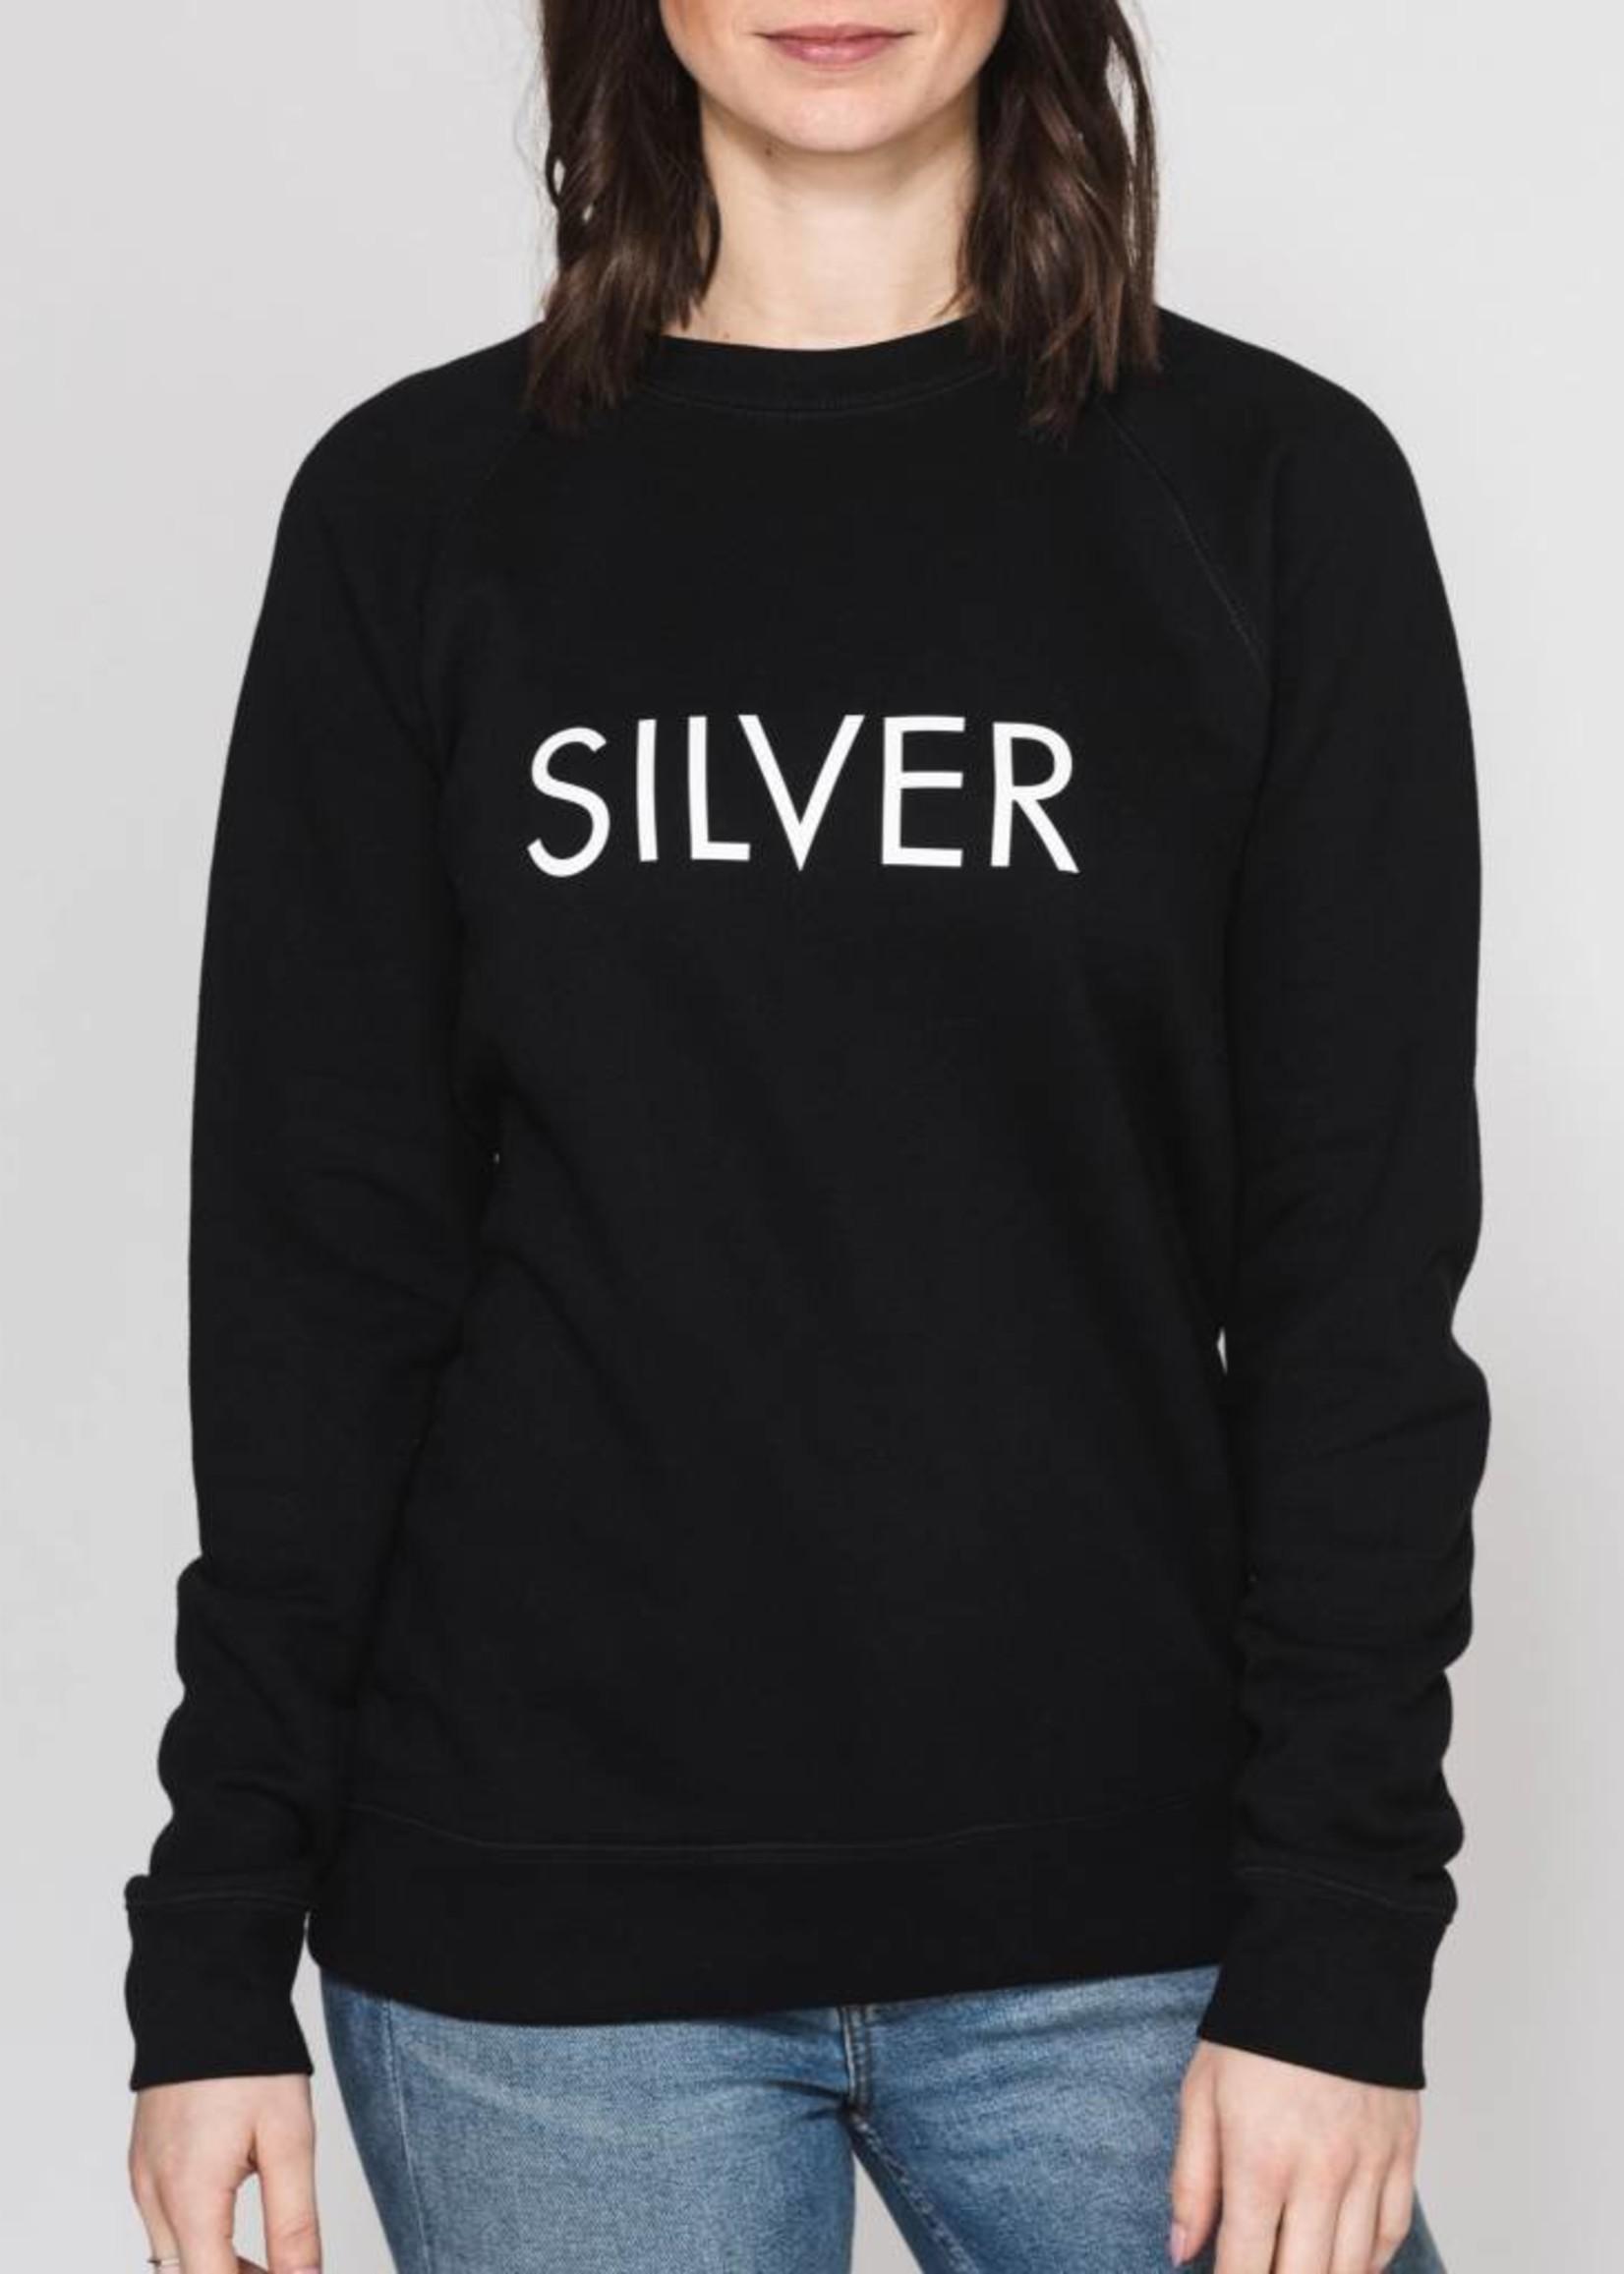 BRUNETTE  the label SILVER Crew, BLACK